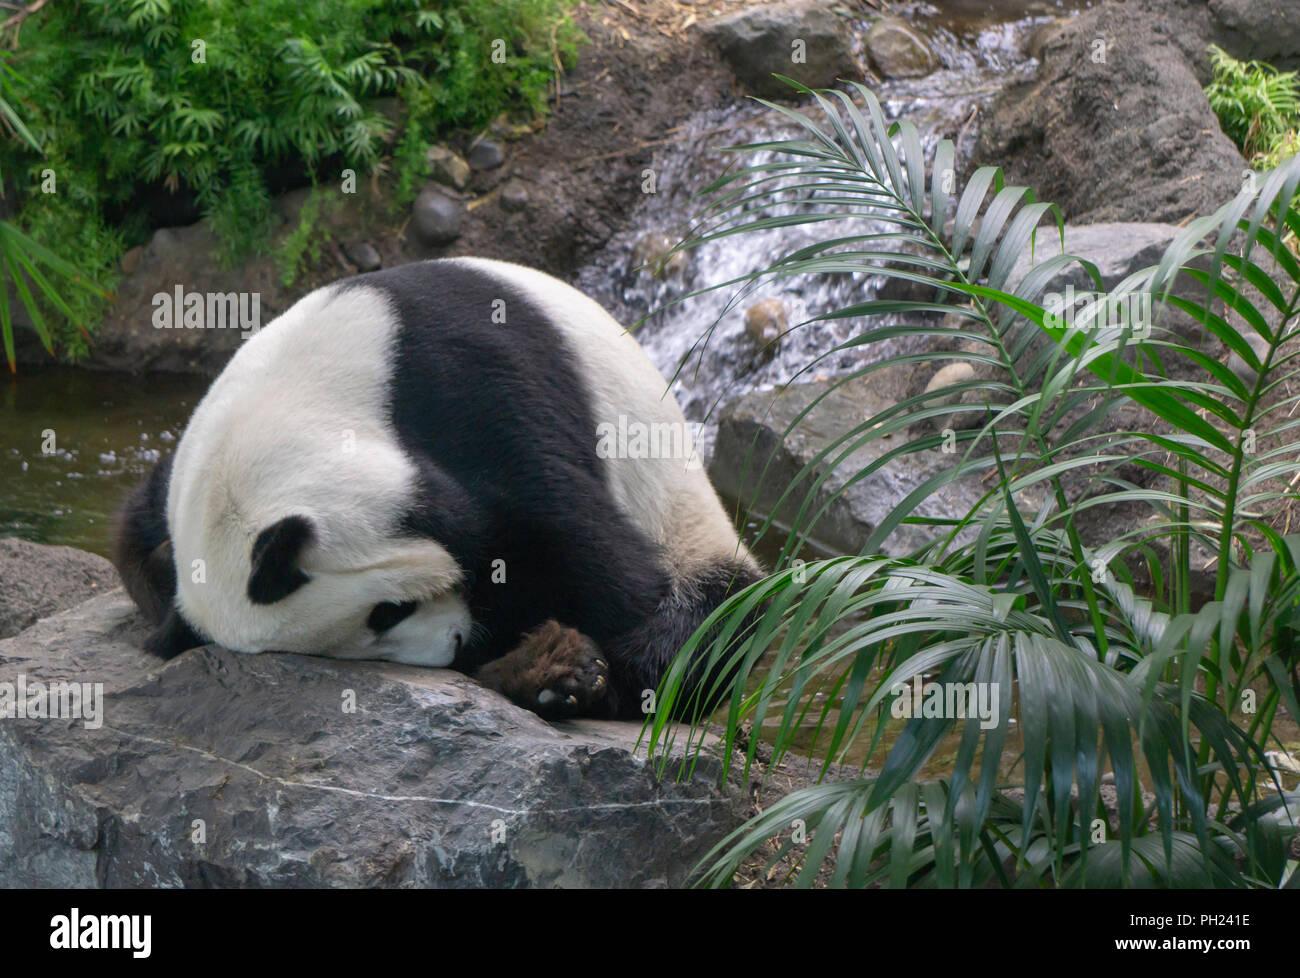 Giant panda Calgary Zoo Alberta Canada - Stock Image